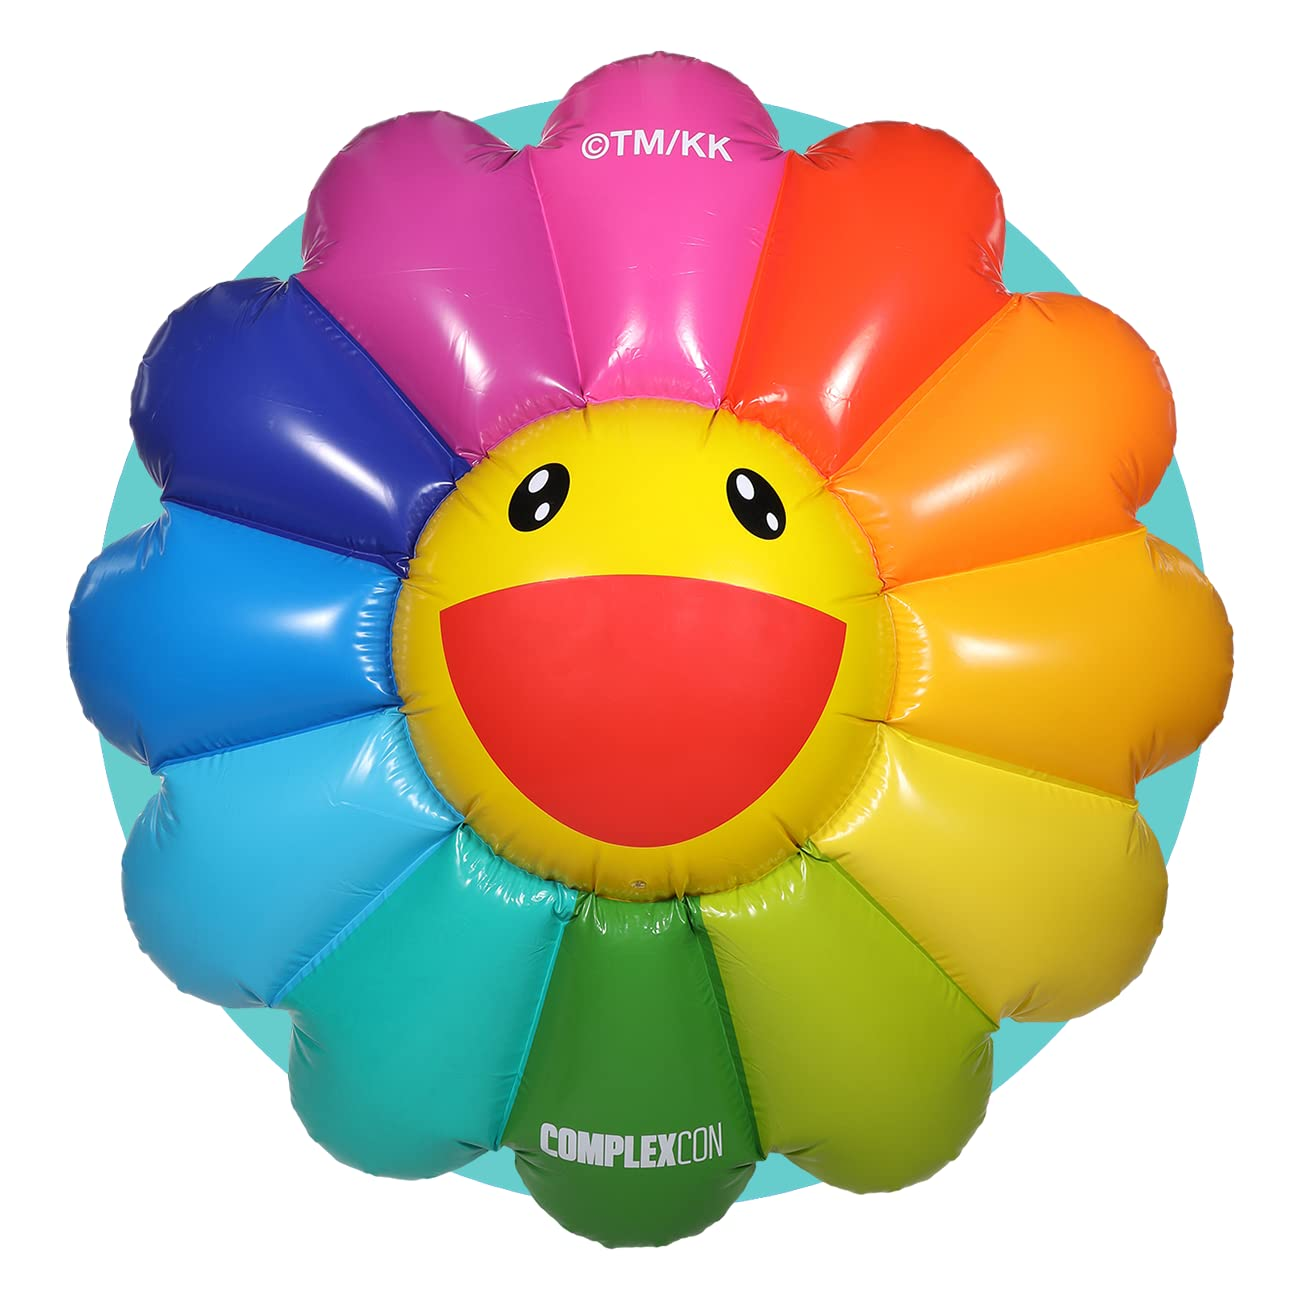 ComplexCon Takashi Murakami Flower Pool Float